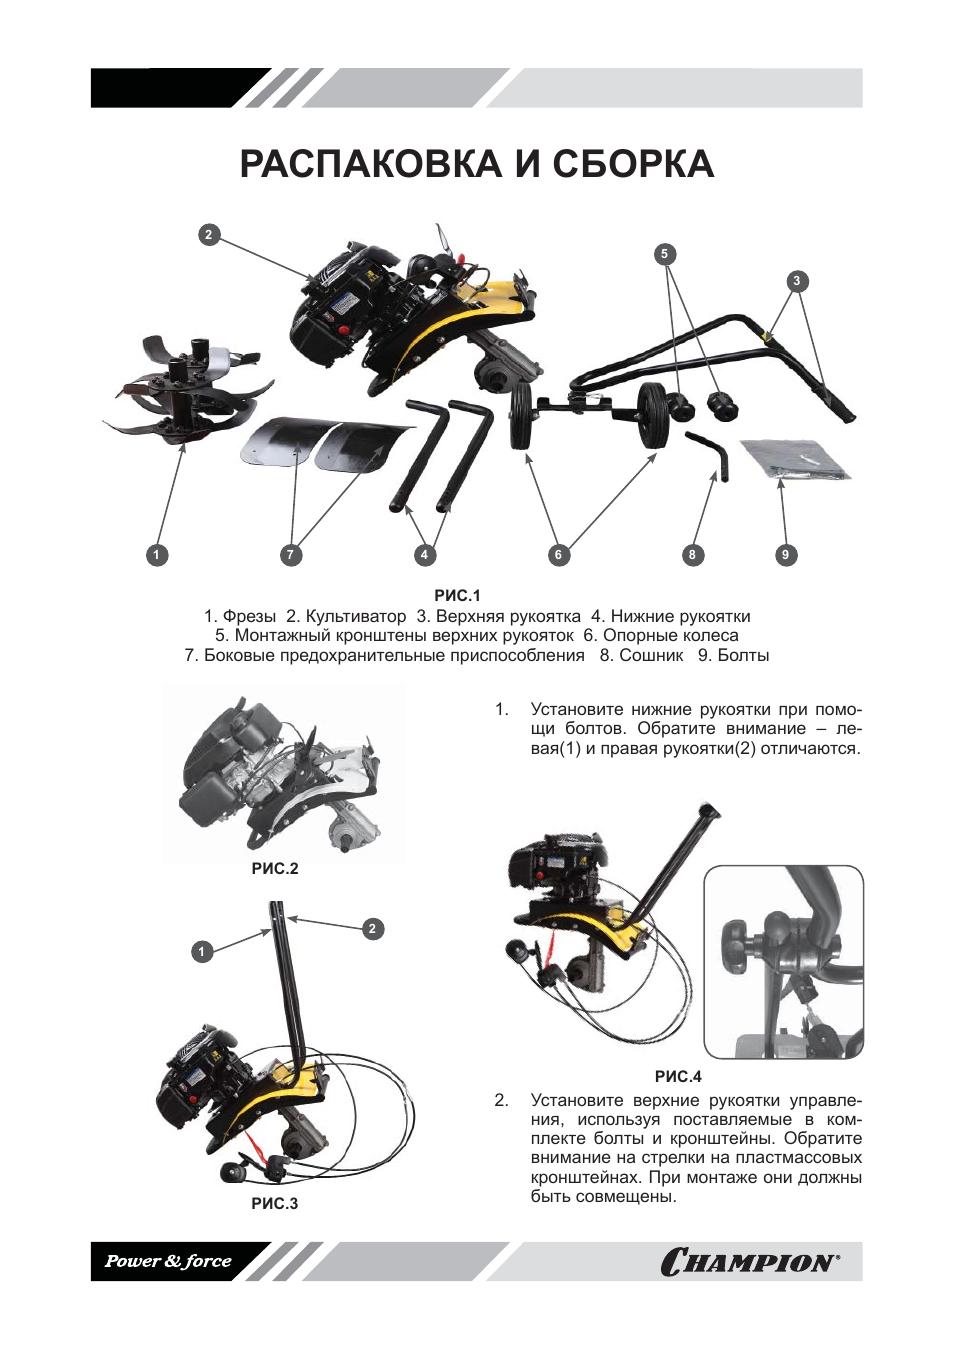 Мотокультиватор huter gmc-5.5 схема сборки